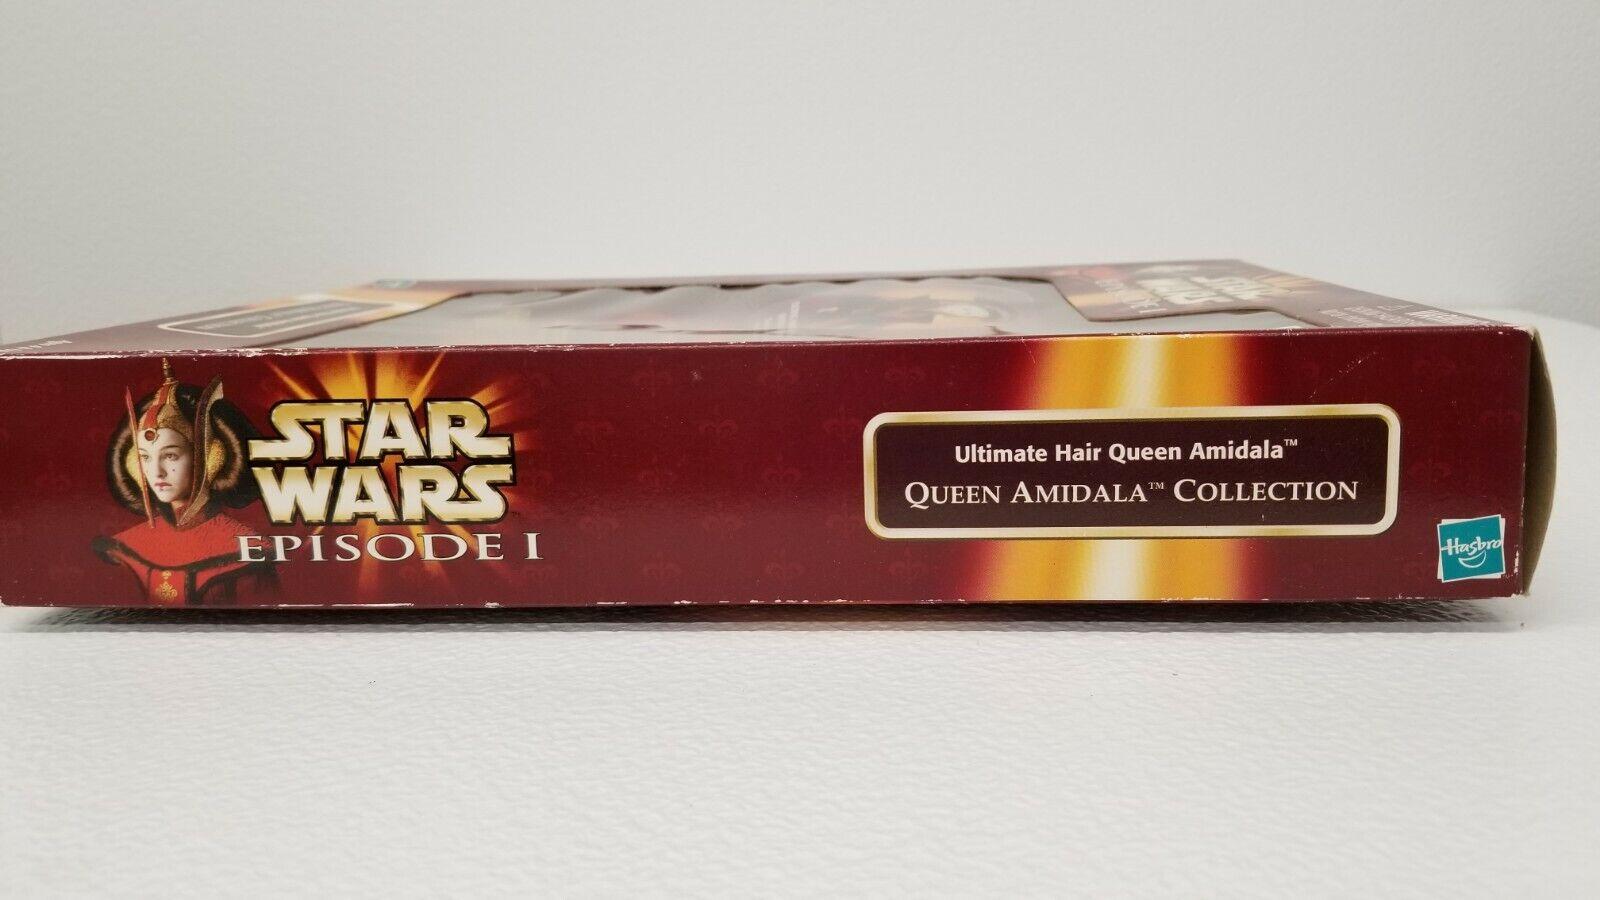 Ultimate Hair Queen Amidala Star Wars Epsod. 1 Queen Amidala Collection NIB NRFB